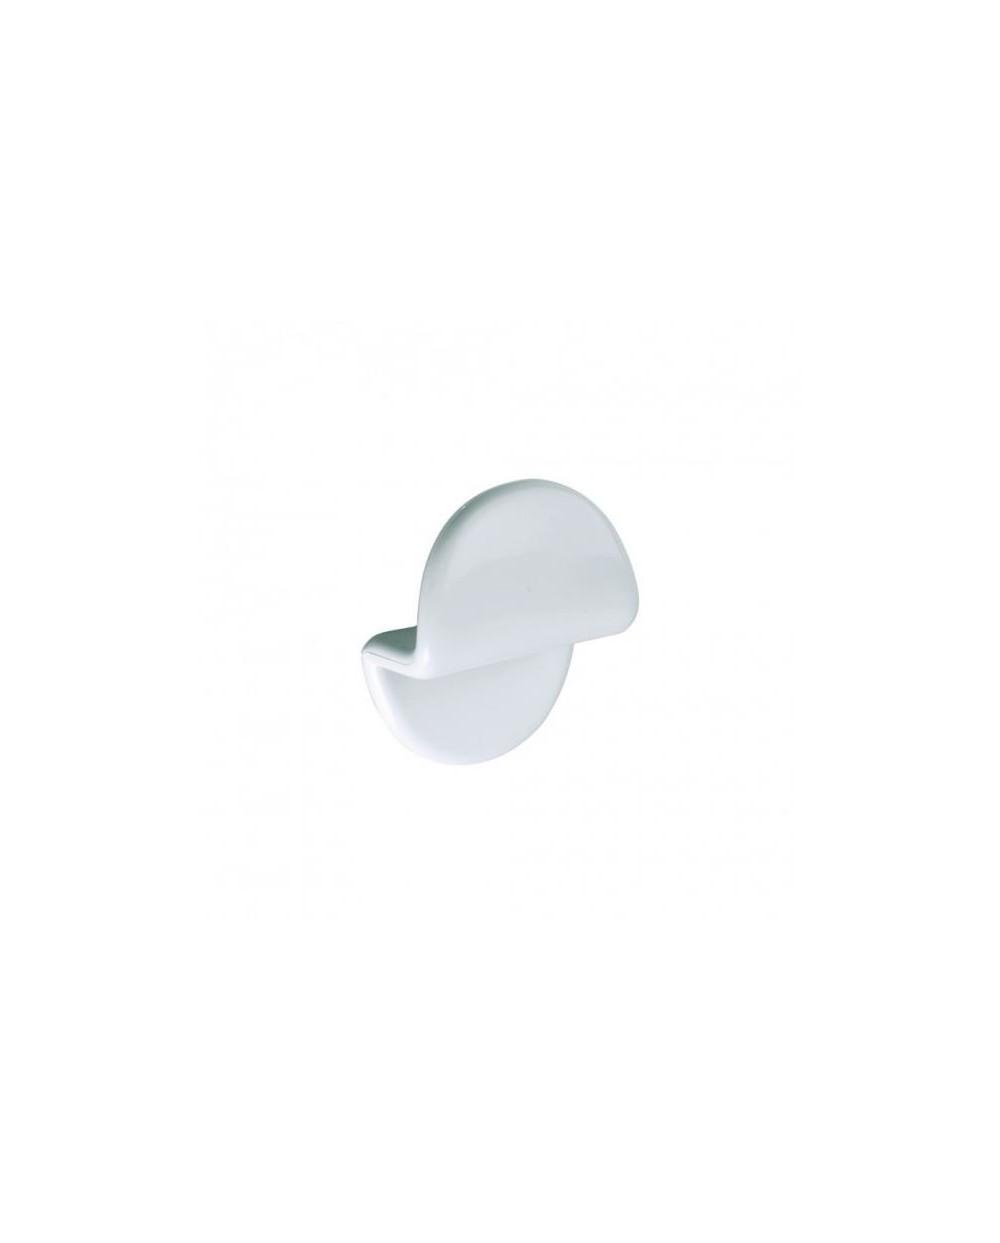 Porte-peignoir, 1 tête, ABS blanc